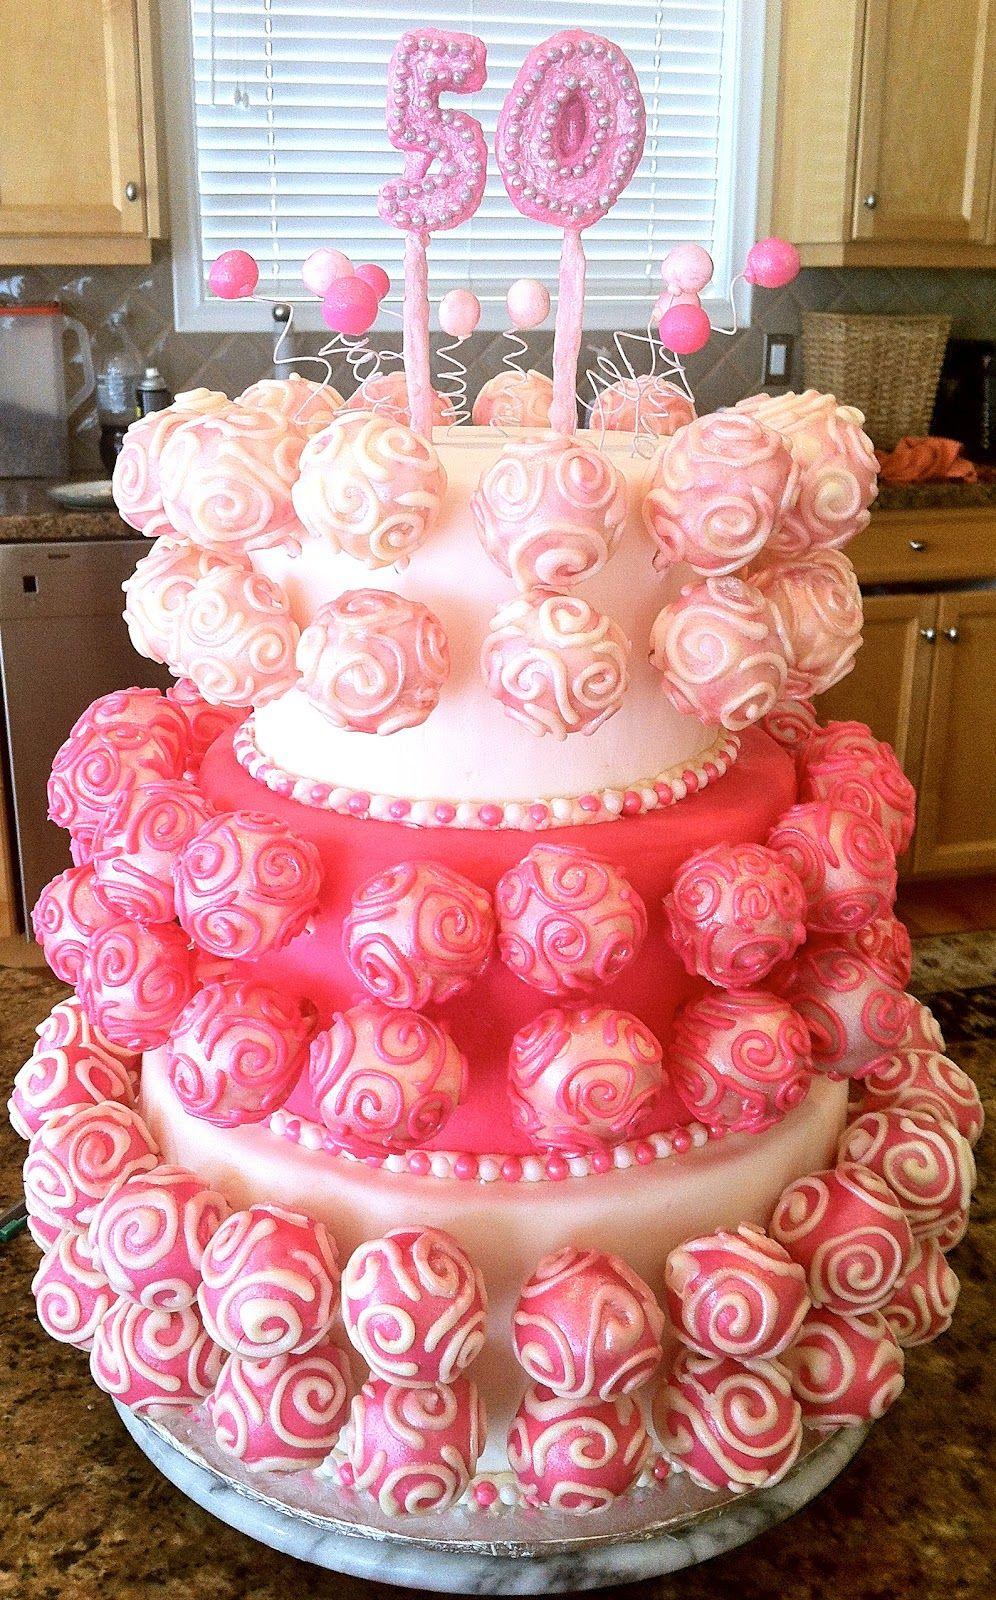 Park Art|My WordPress Blog_Birthday Cake Skinny Pop Review